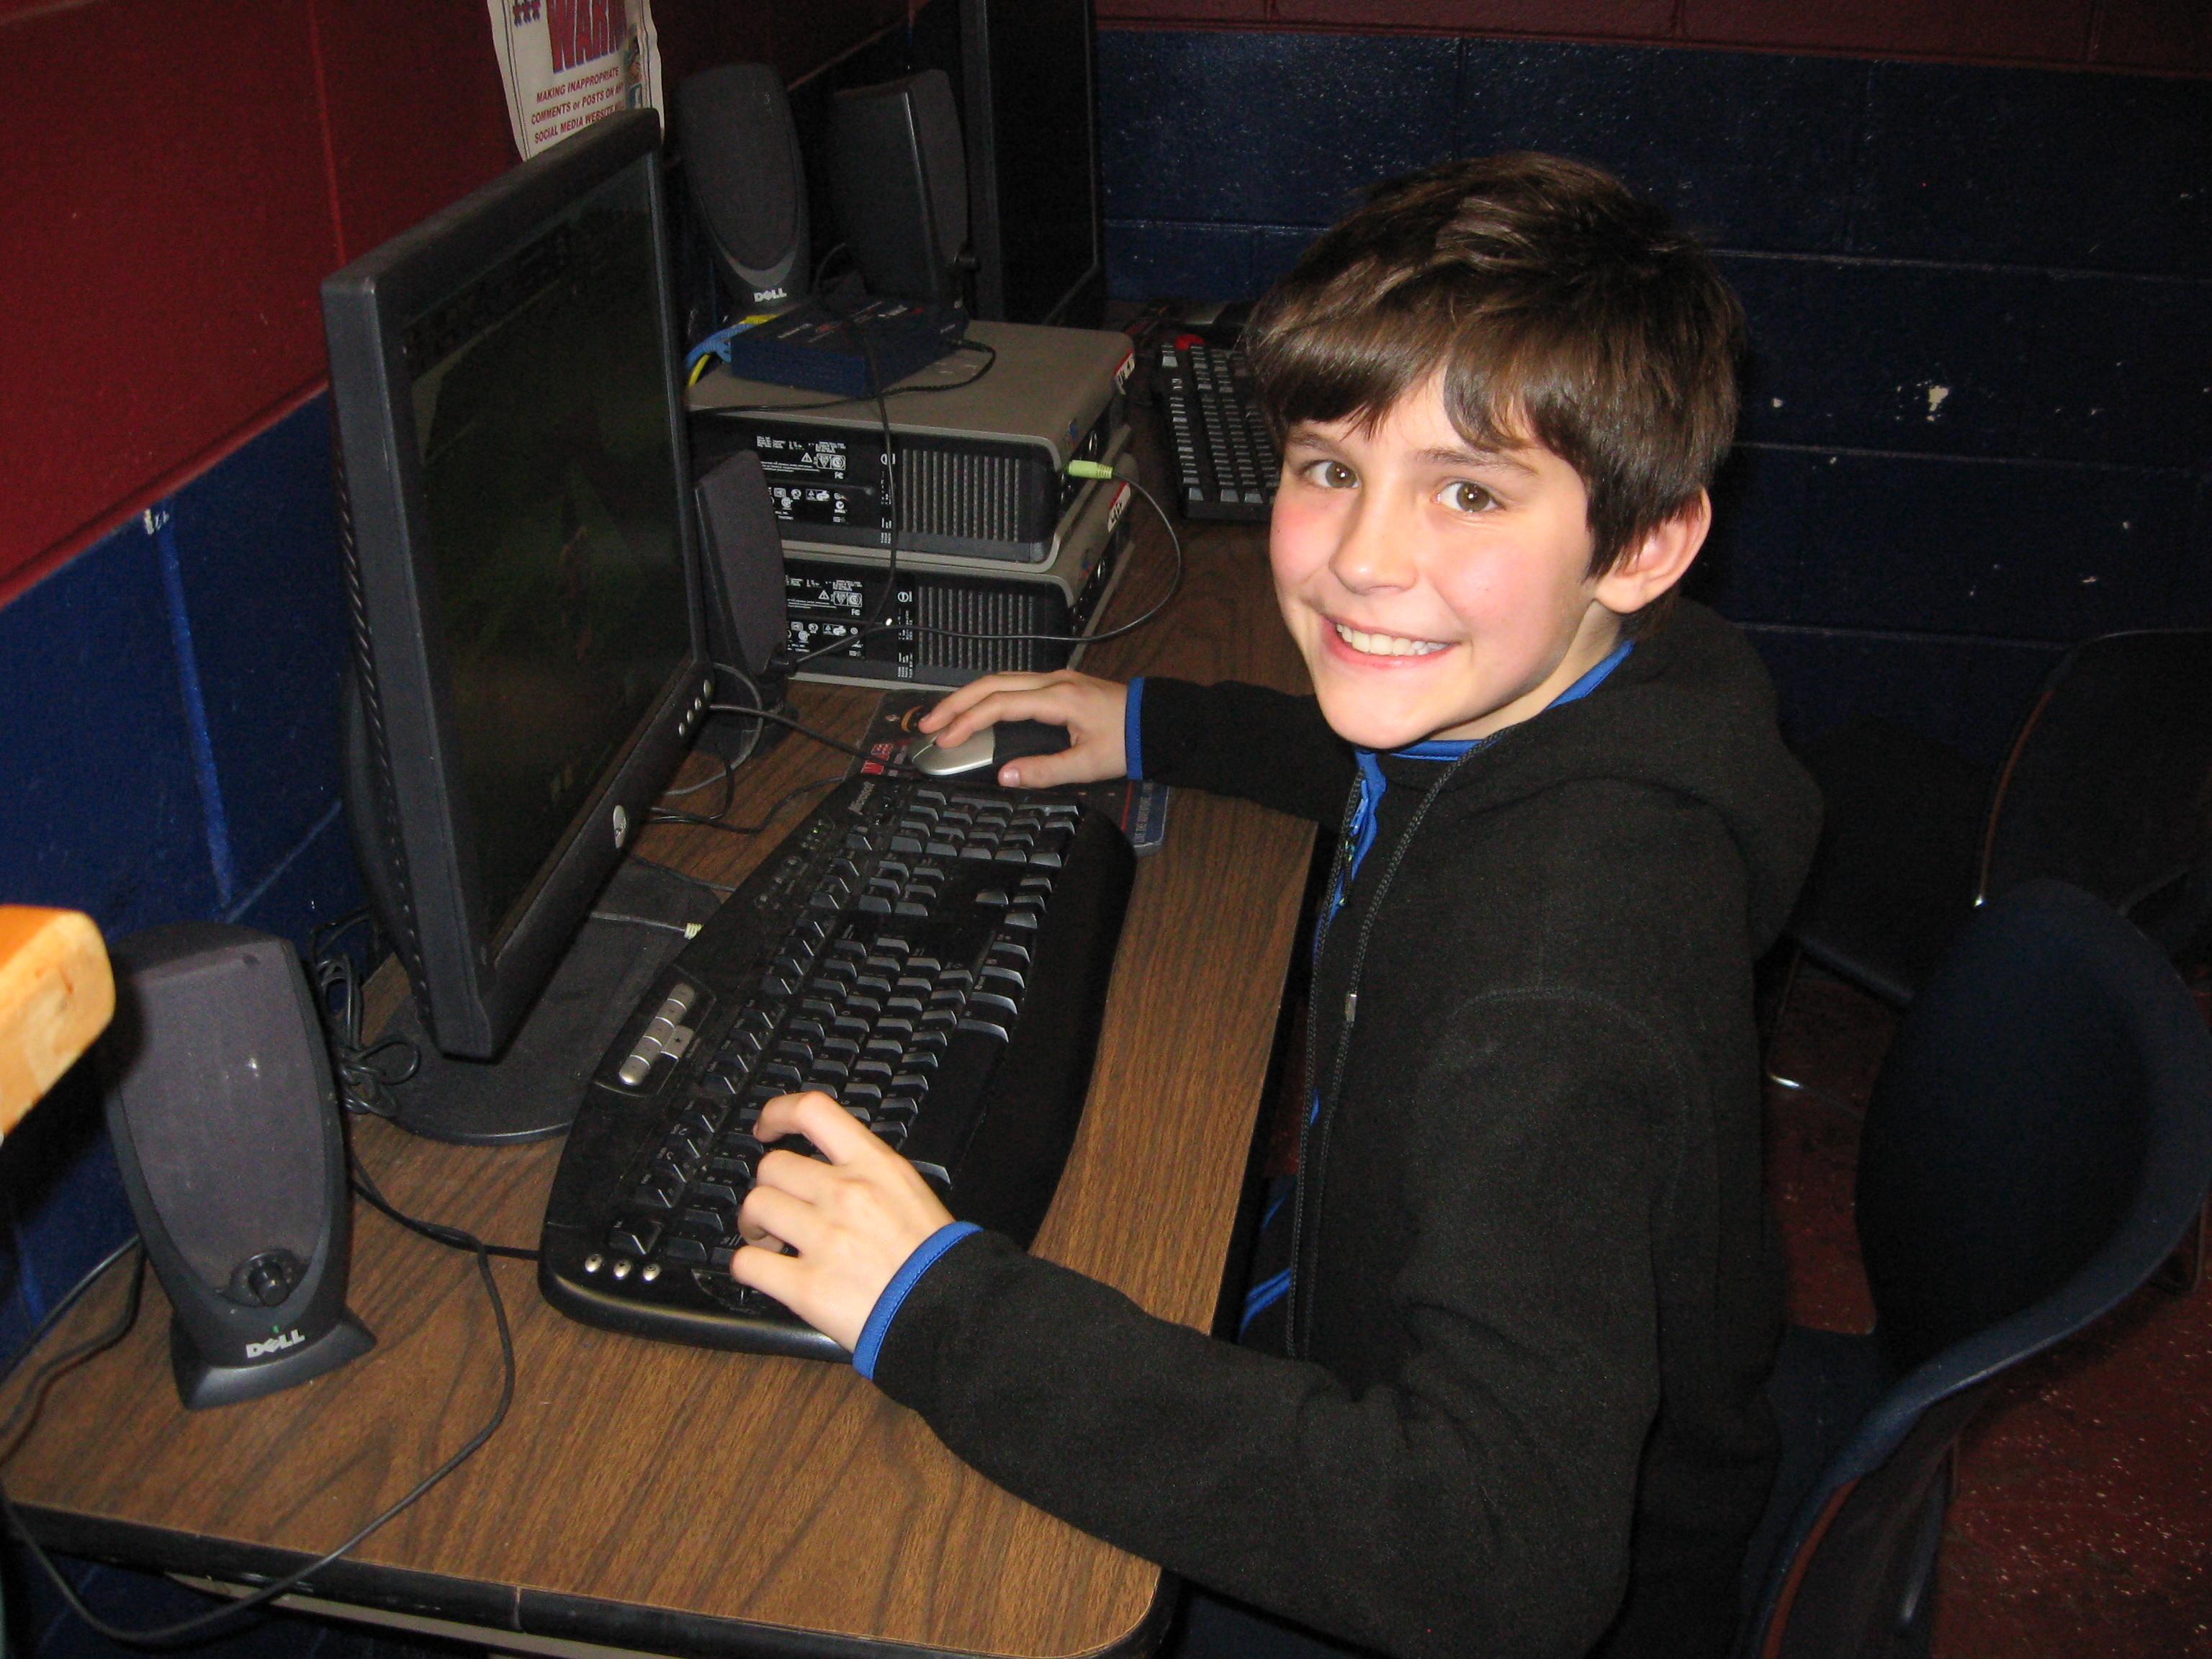 Dover Teen Center Provides 30